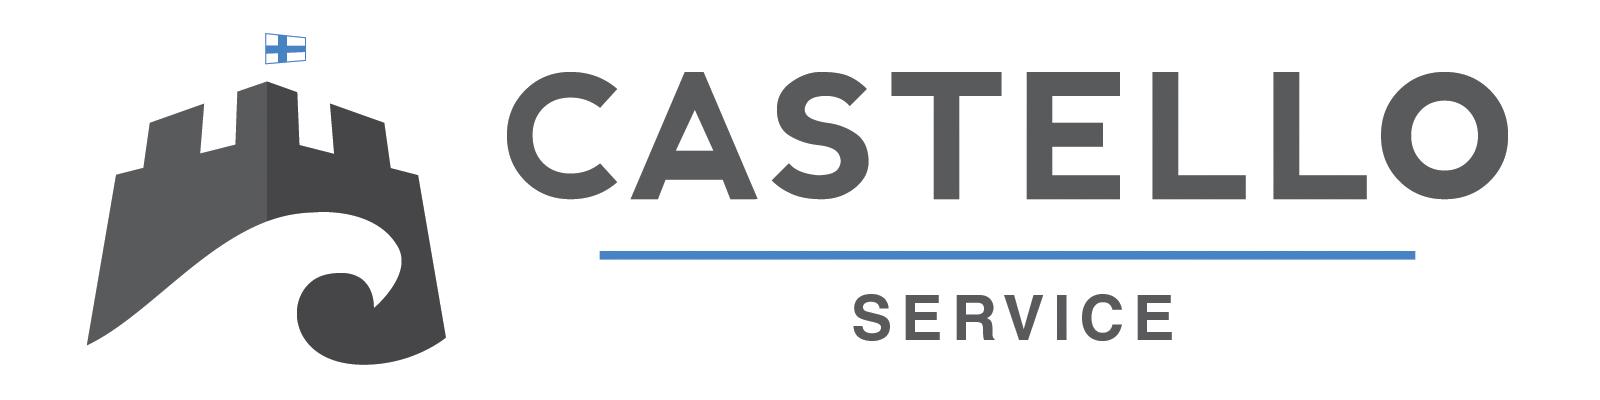 castello_service-logo.png